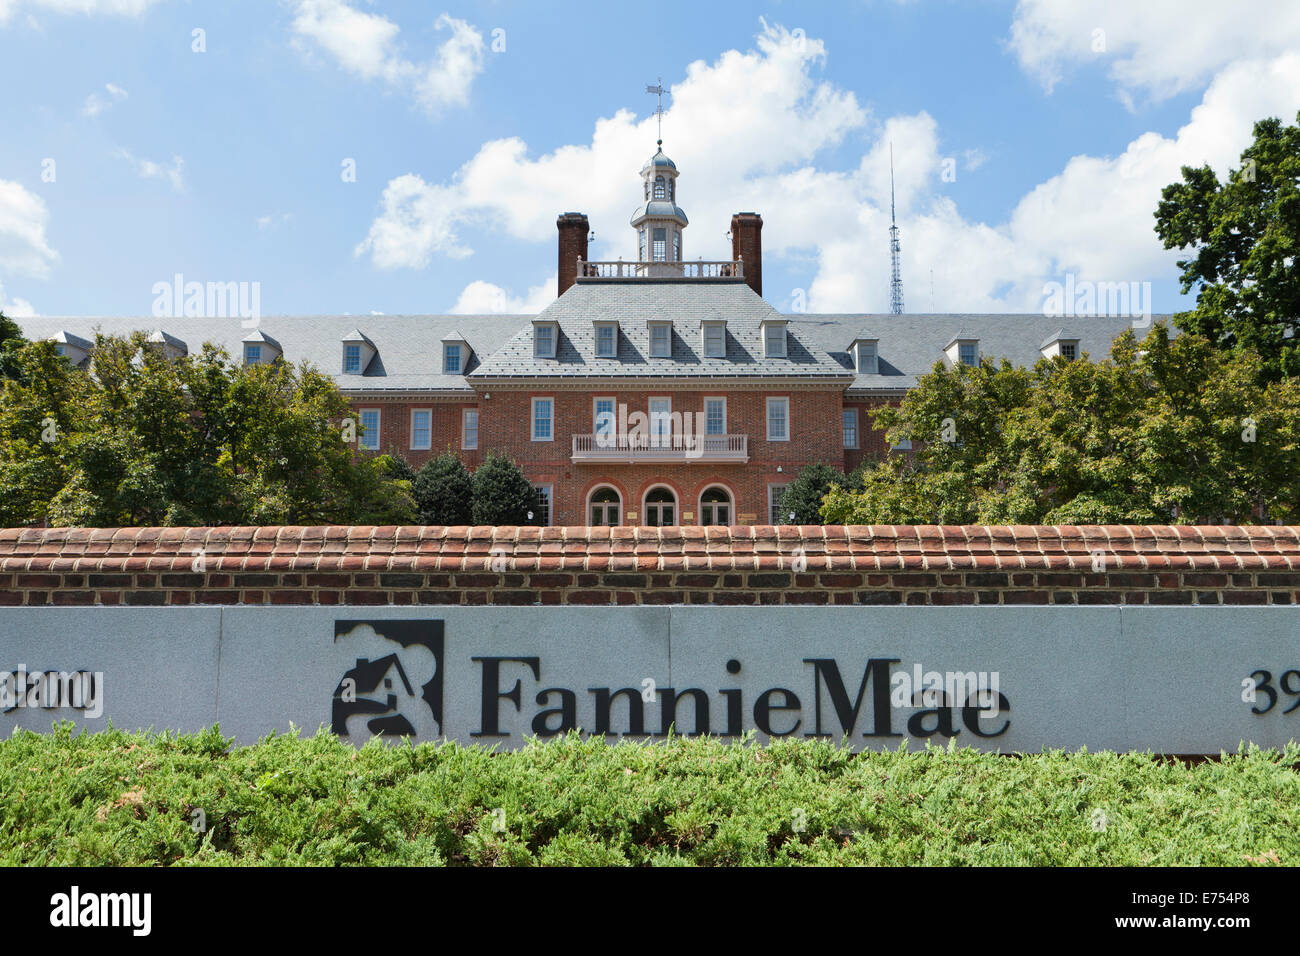 Fannie Mae building - Washington, DC USA - Stock Image